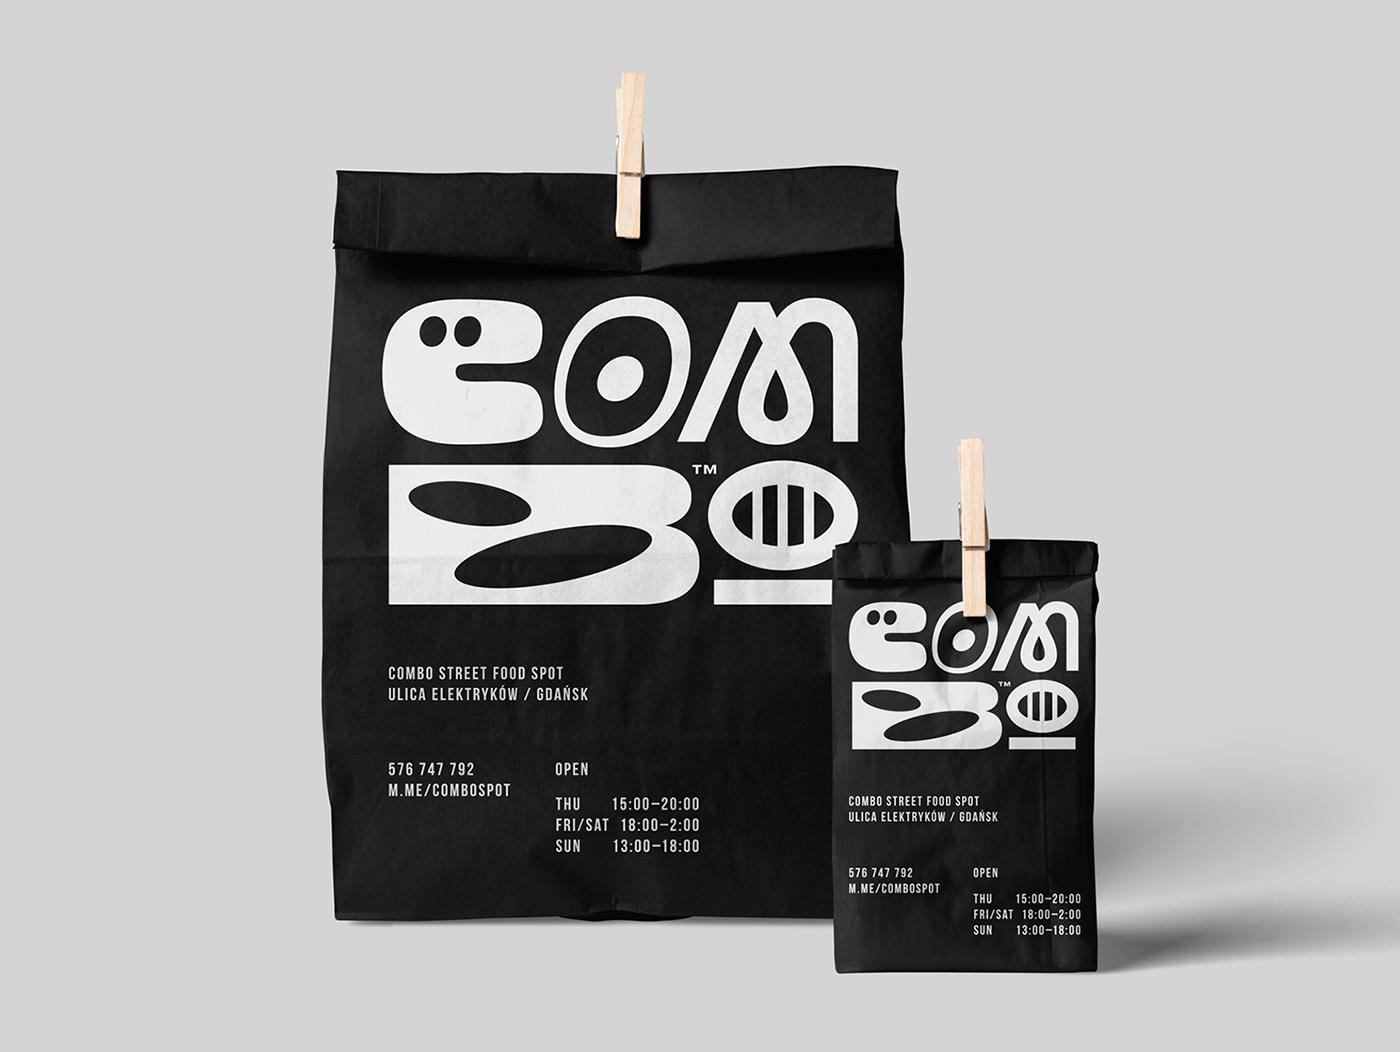 Street Food Food  Culinary restaurant gastronomy fastfood logo bag cup Coffee